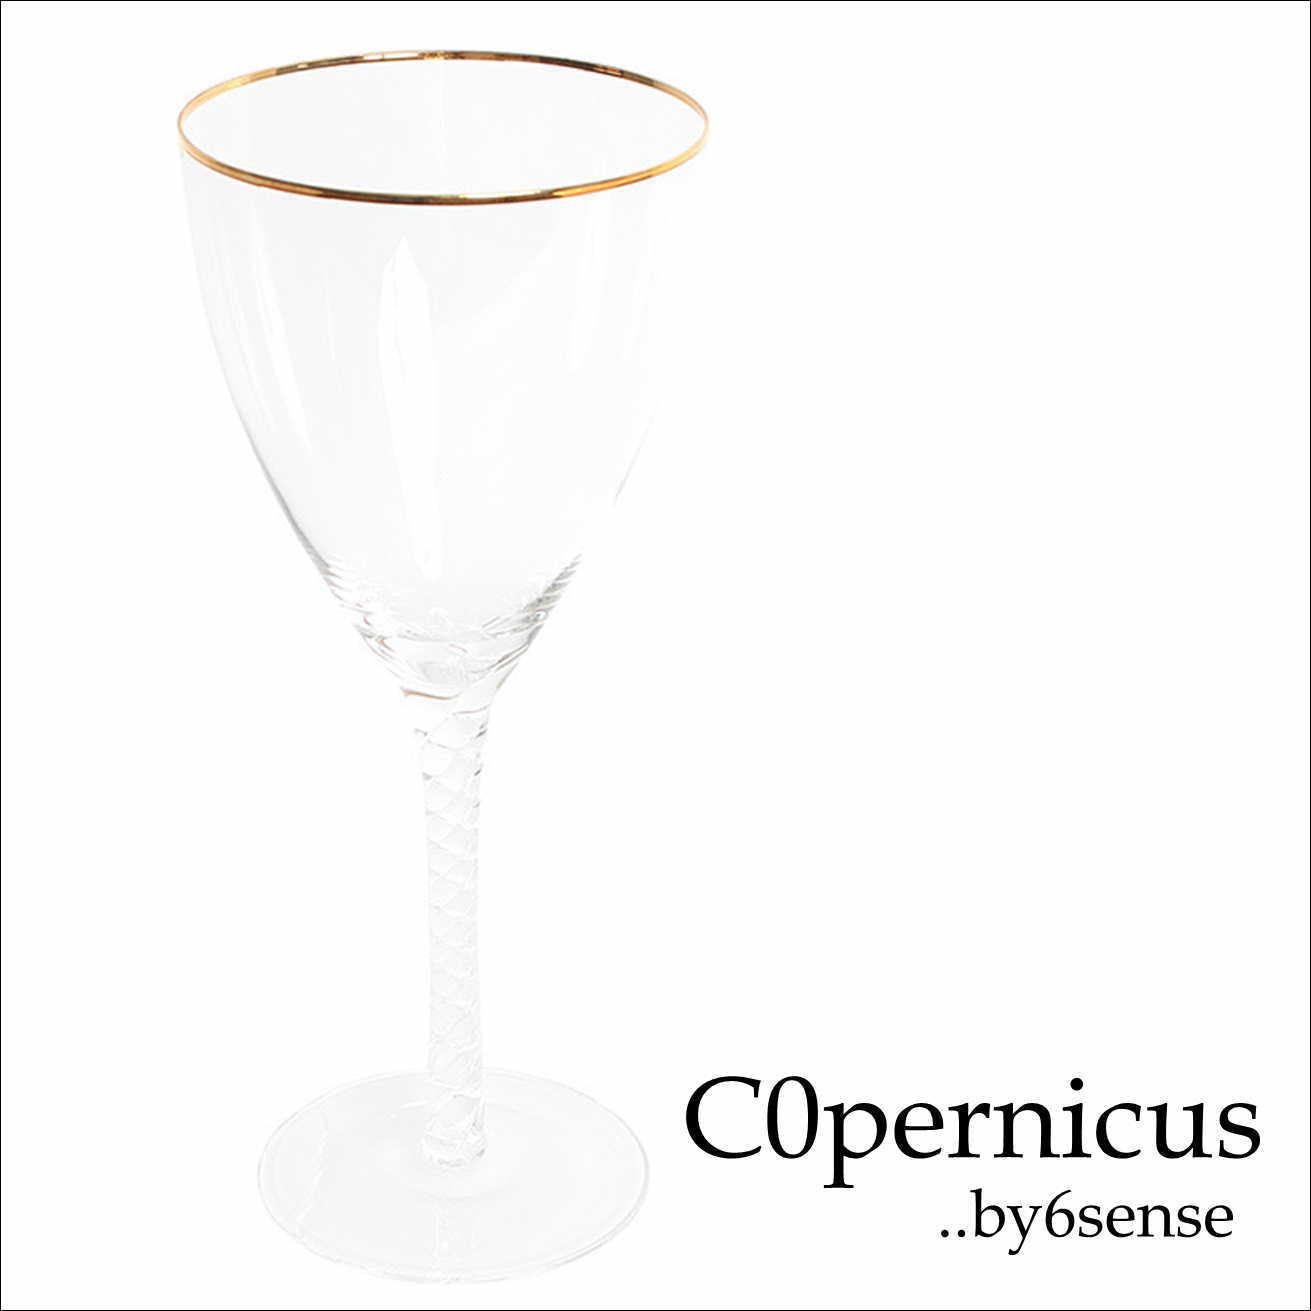 Wineglass ワイングラス Goldline 浜松雑貨屋 C0pernicus